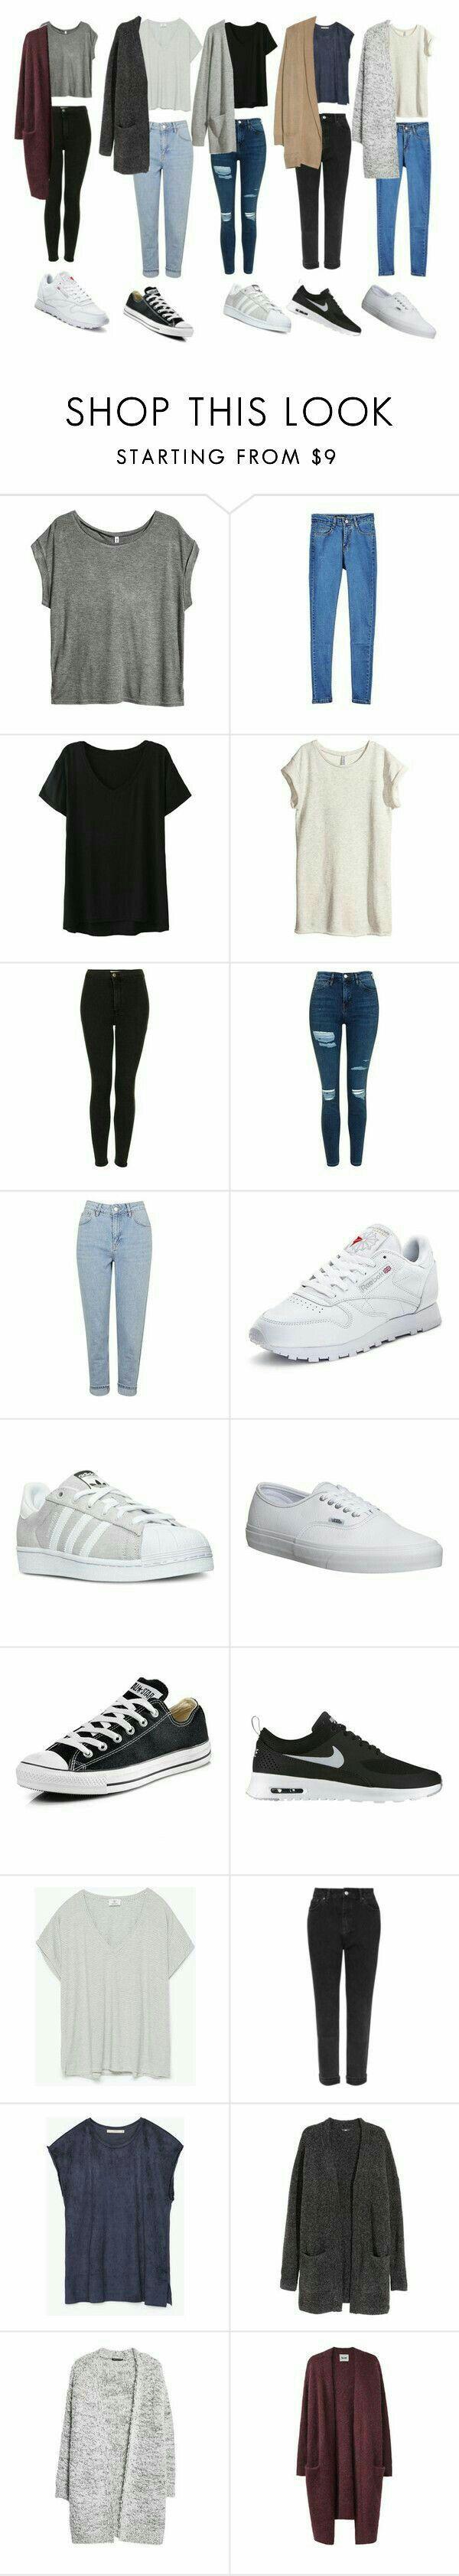 Para la semana casual pinterest google clothes and school outfits